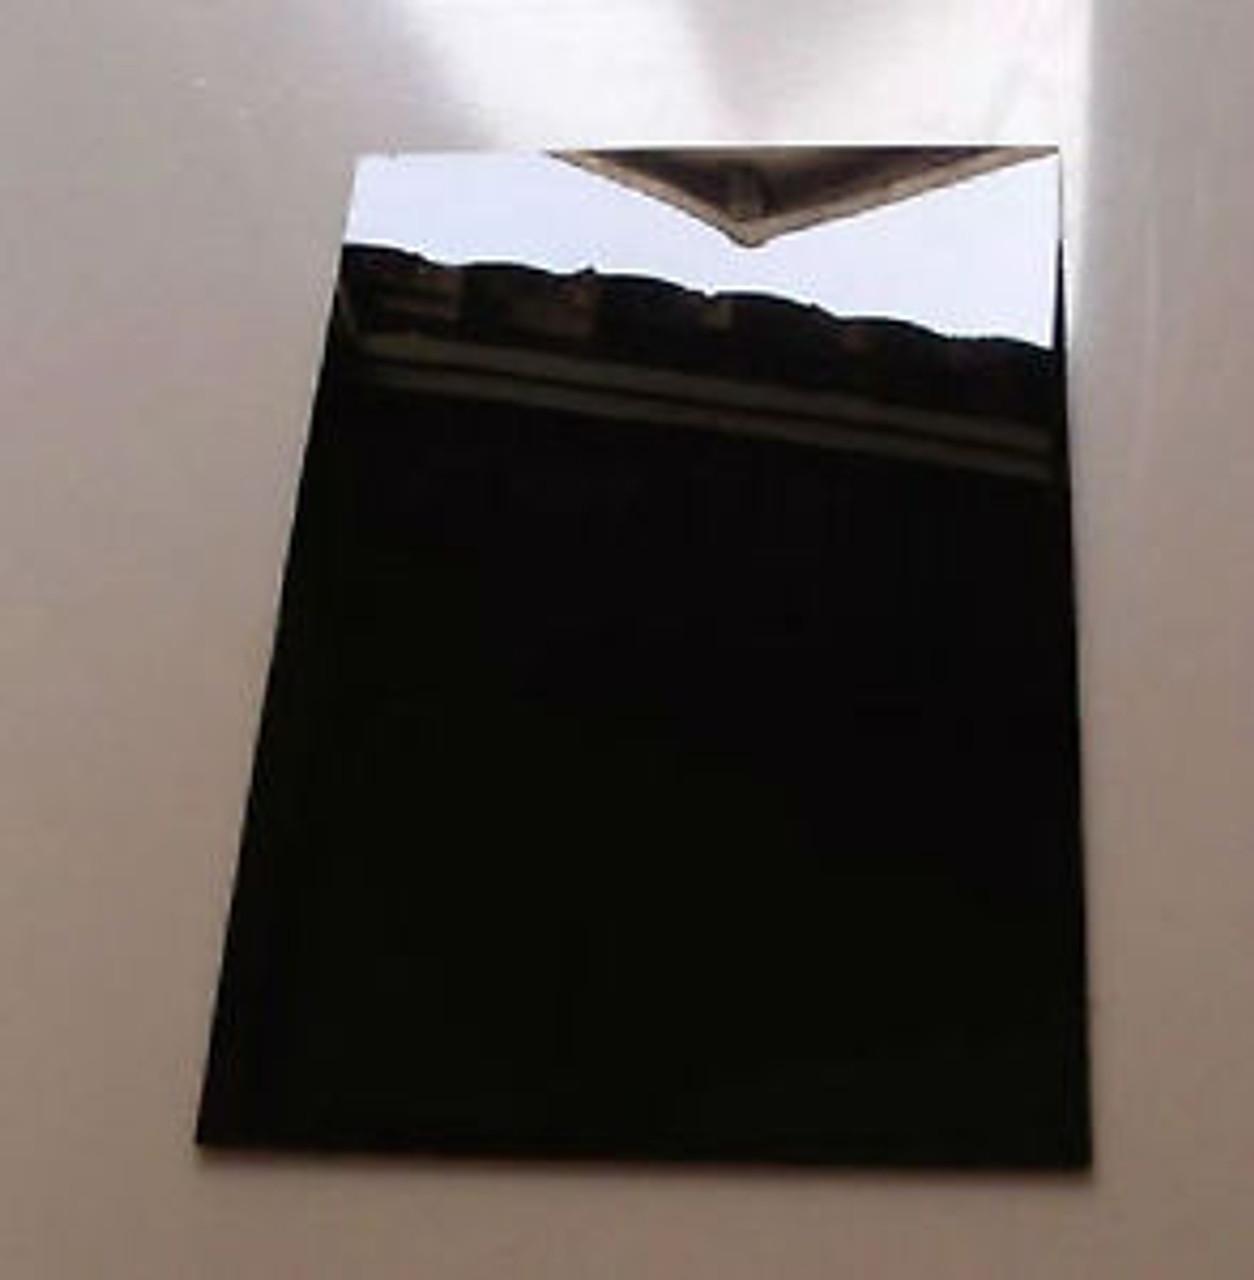 "4' x 8' x 1/4"" Opaque Black Acrylic Sheet, 2 side Glossy"